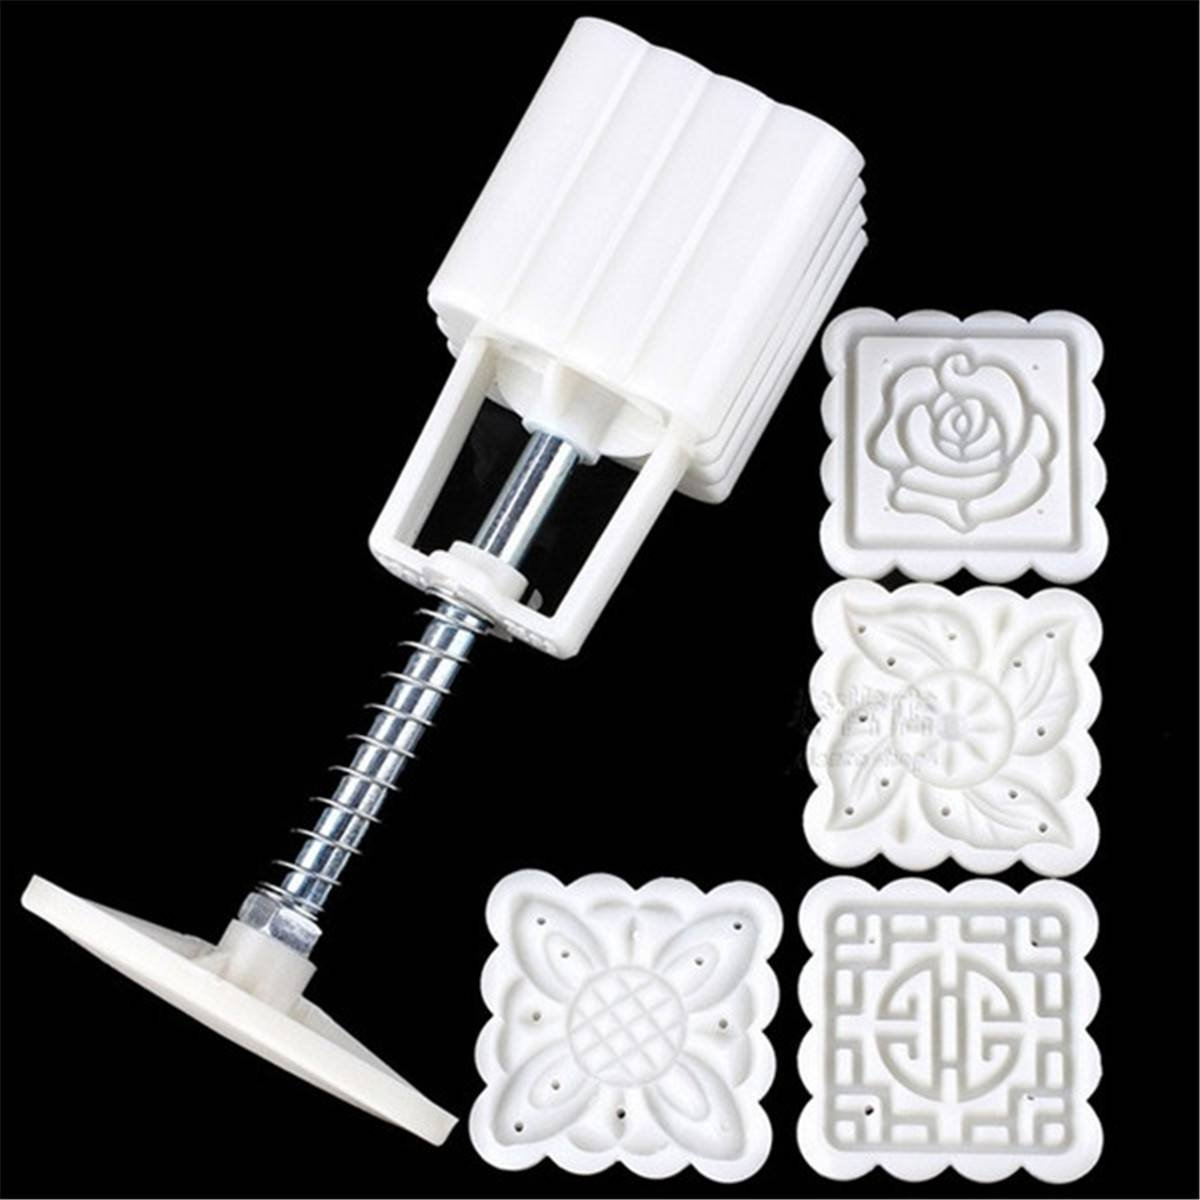 KINGSO Mooncake Fodant Gift DIY Moon Cake Mold 4 Flower Plant Stamps Decor Mould (Square) KINGSOokiuhg1322